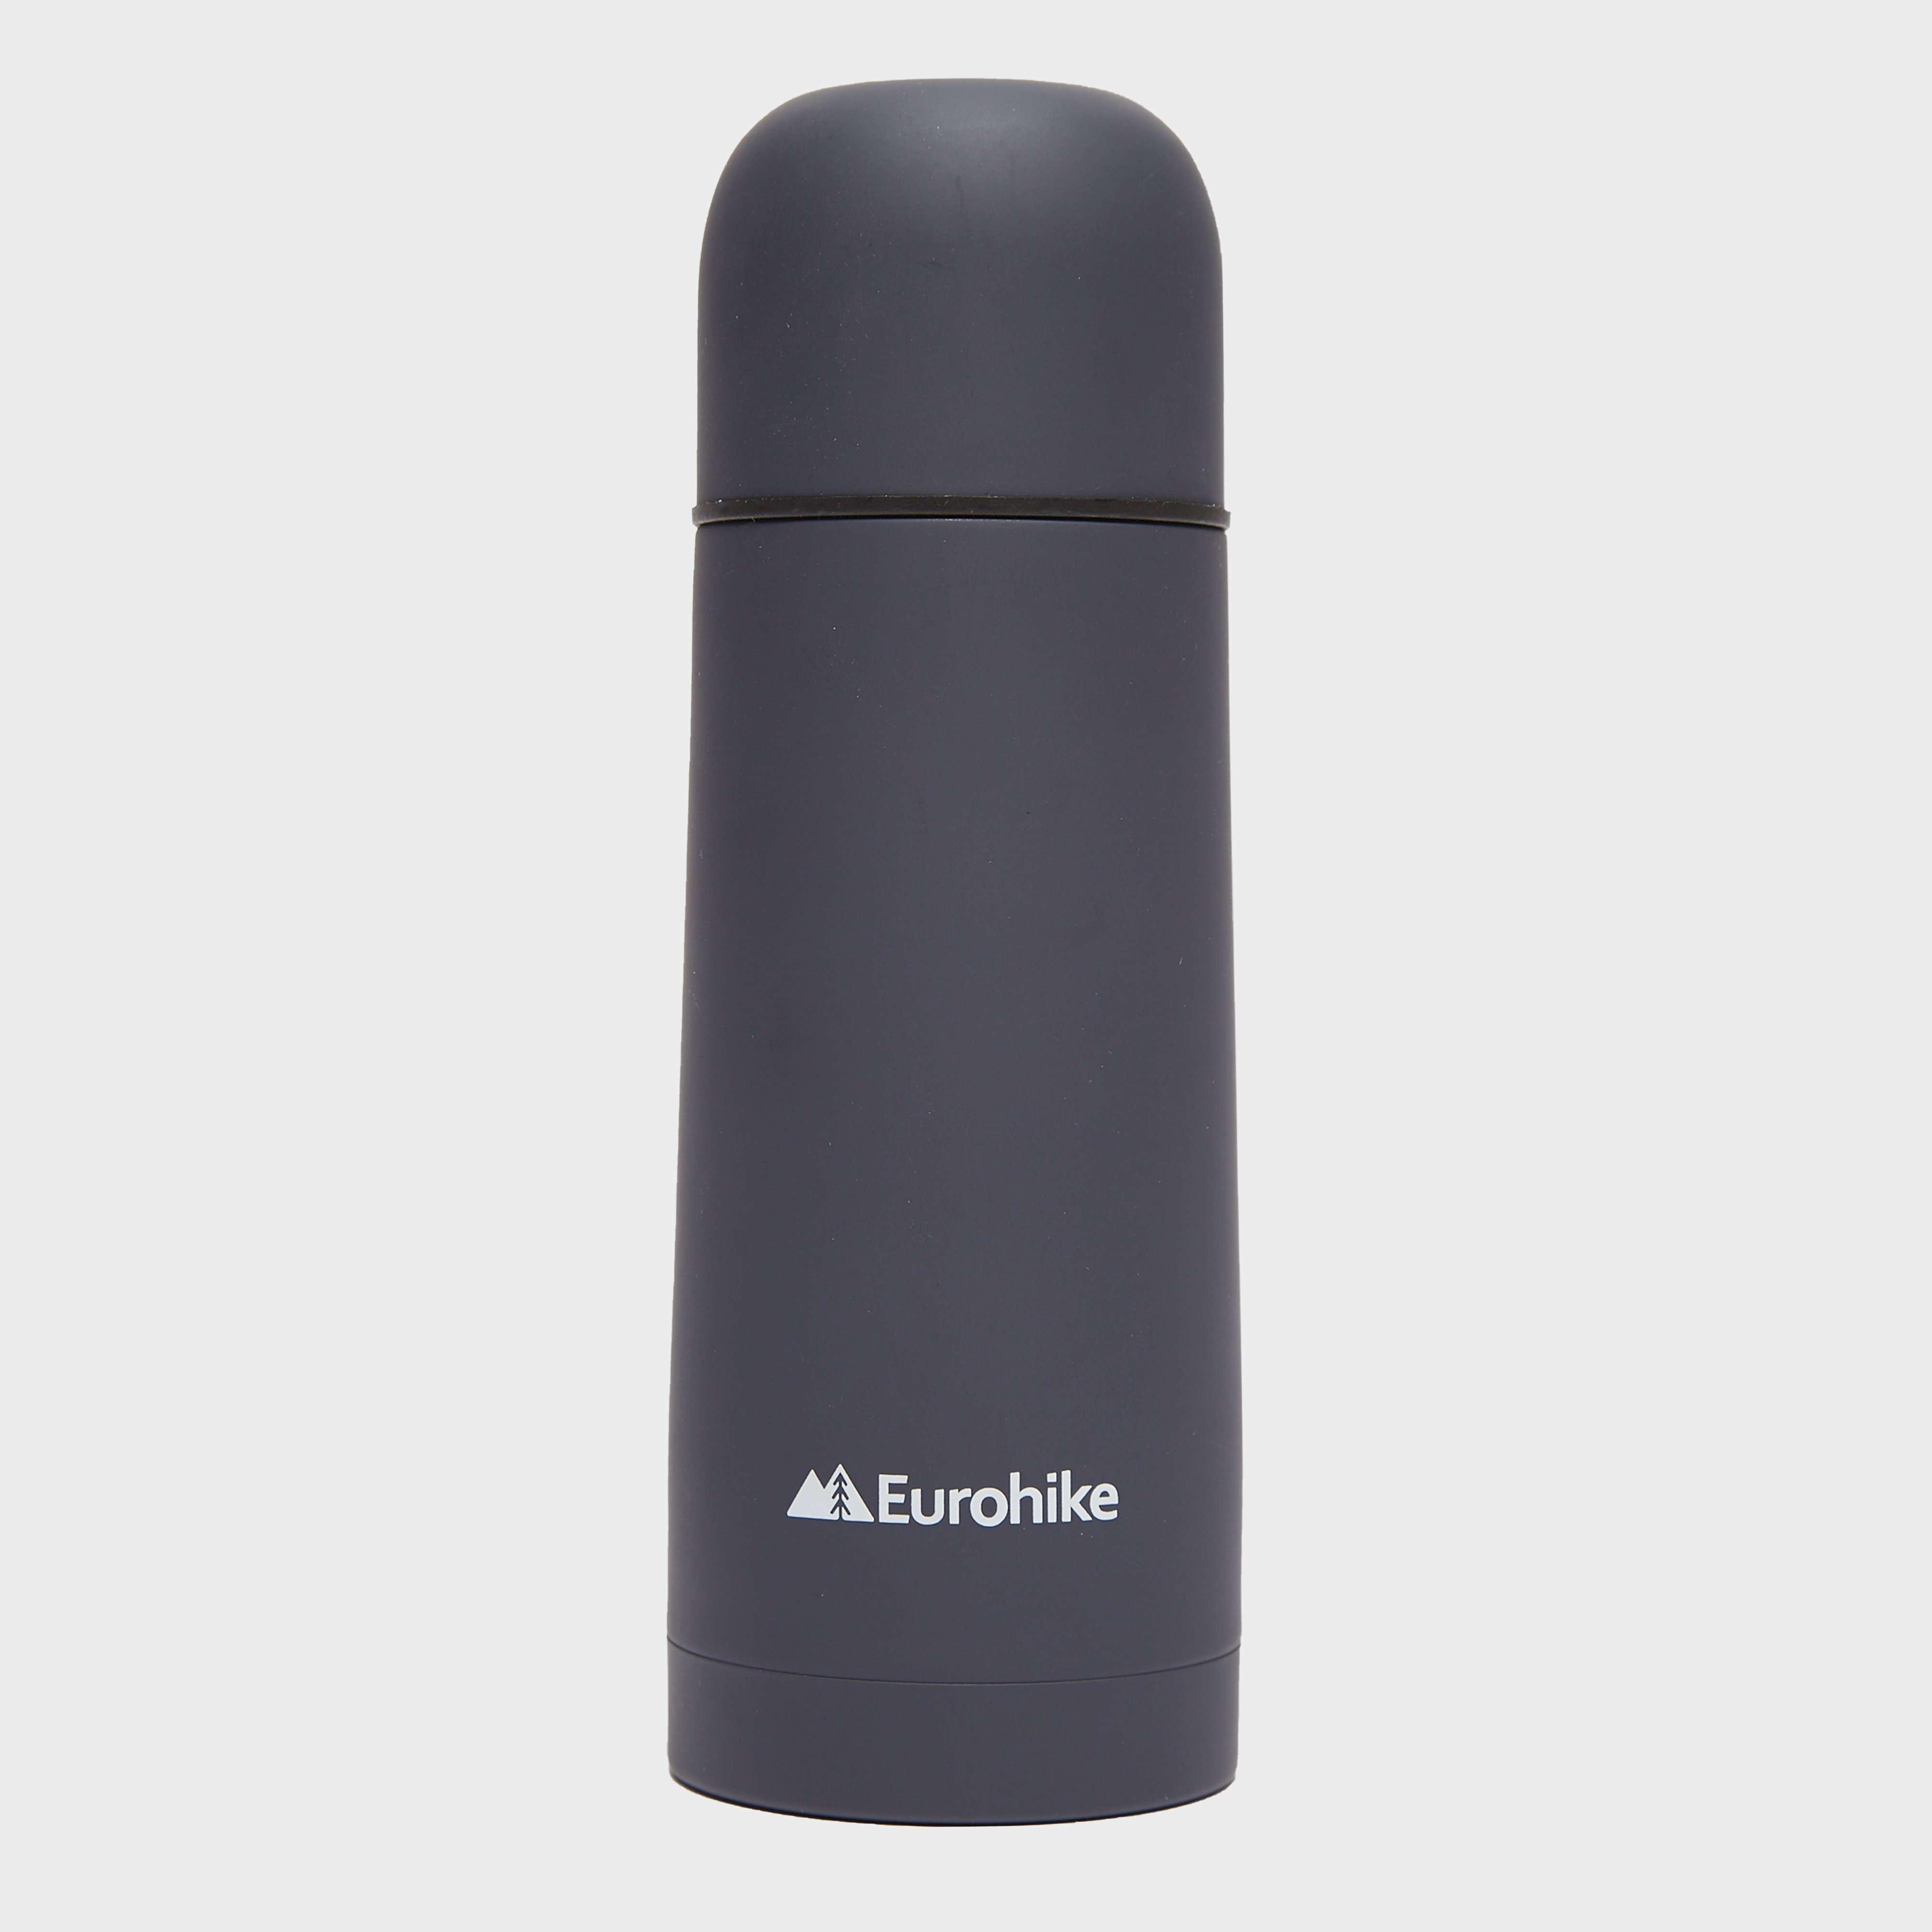 EUROHIKE 0.3L Rubberised Flask